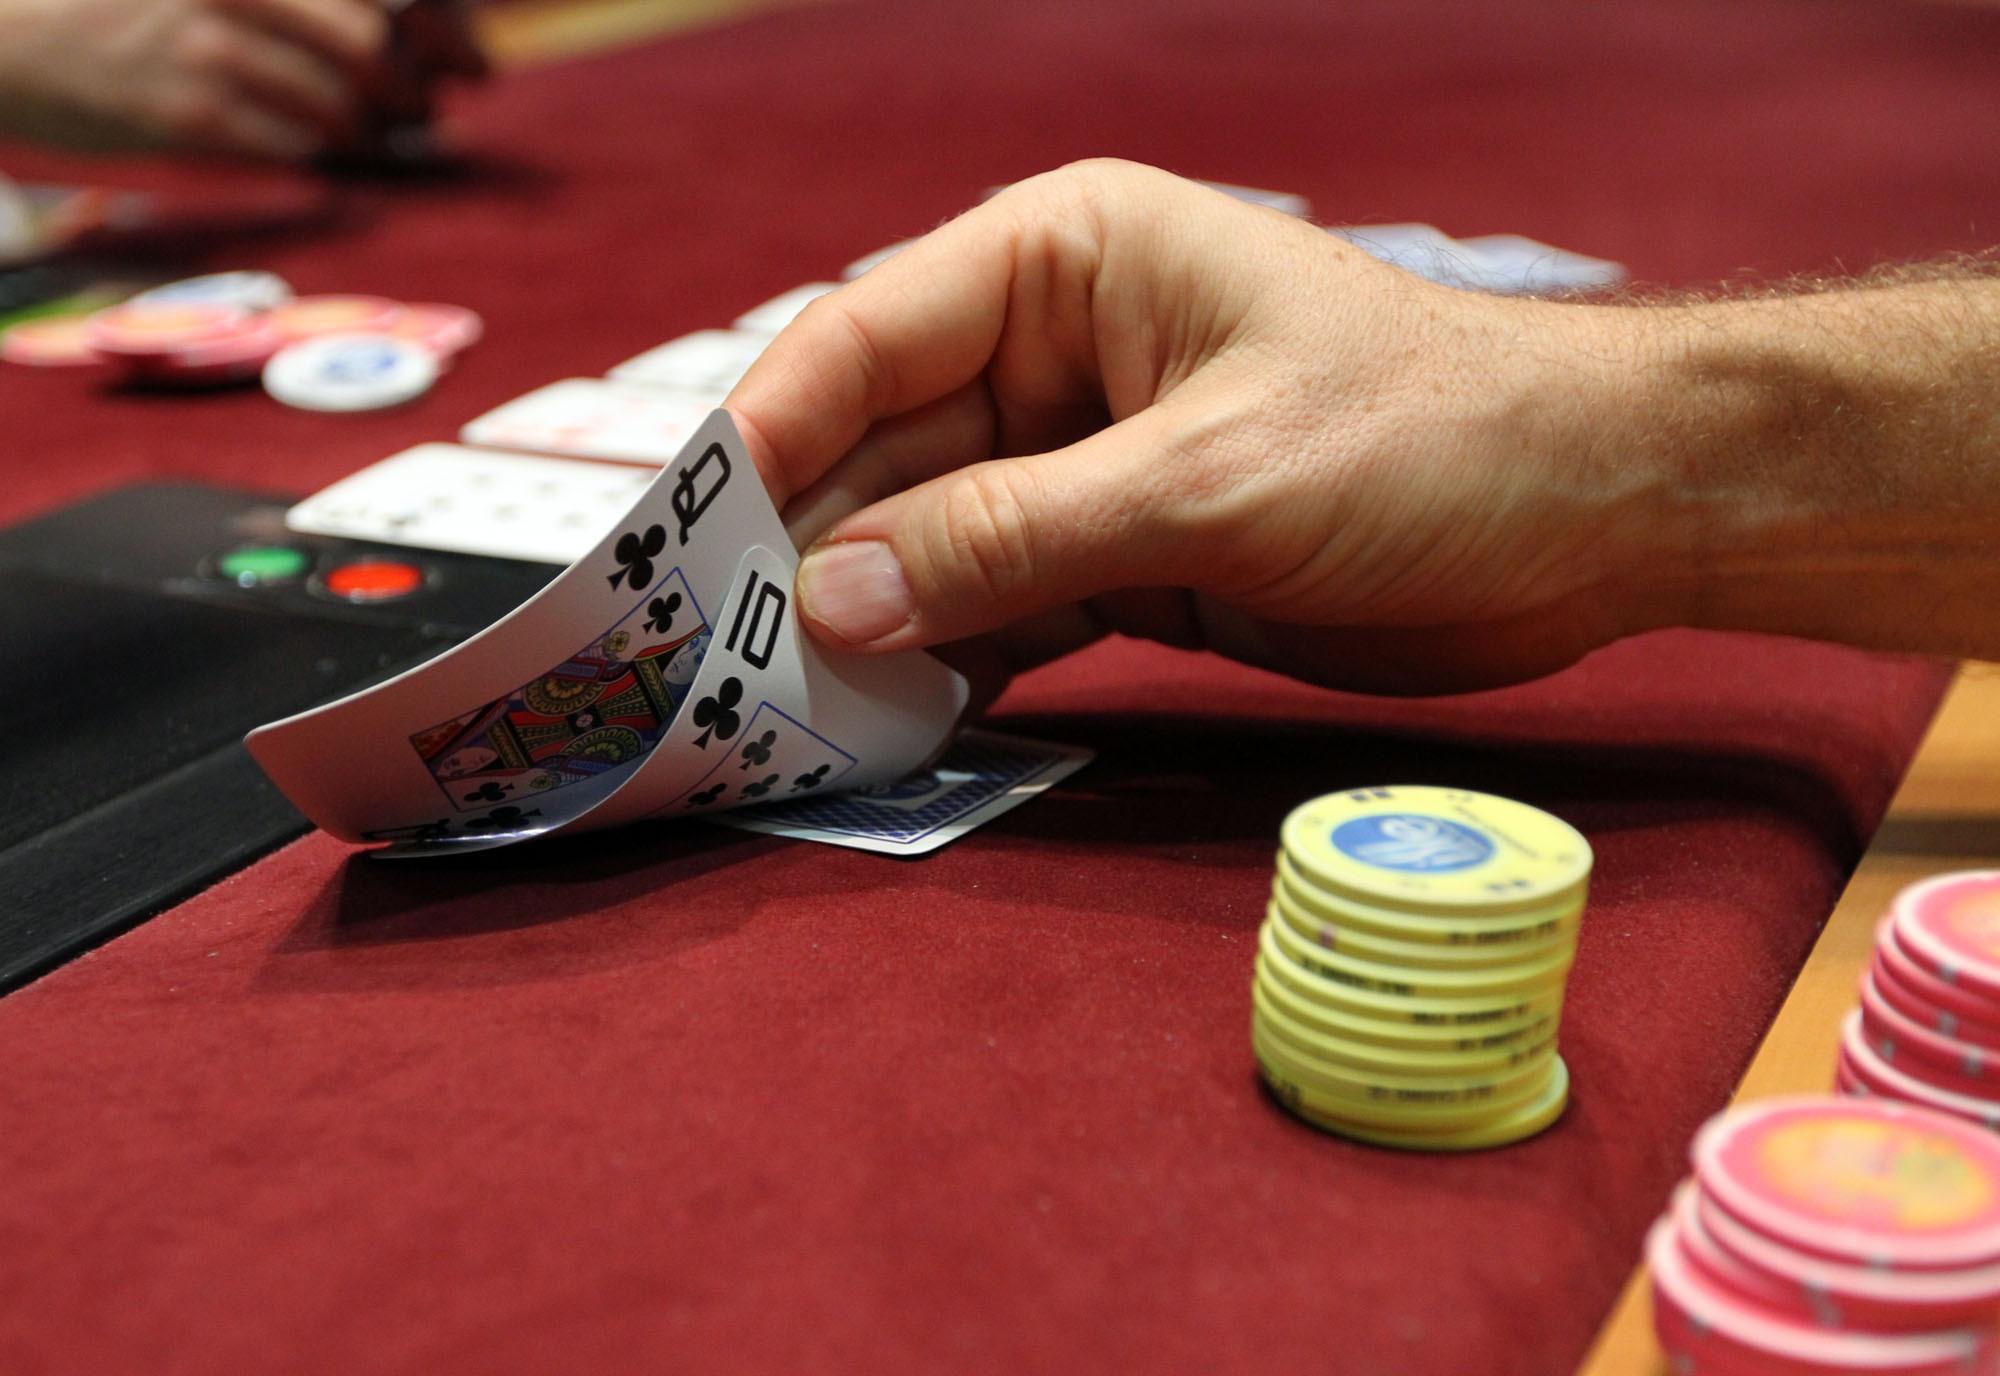 Isle poker series starts today - Sun Sentinel